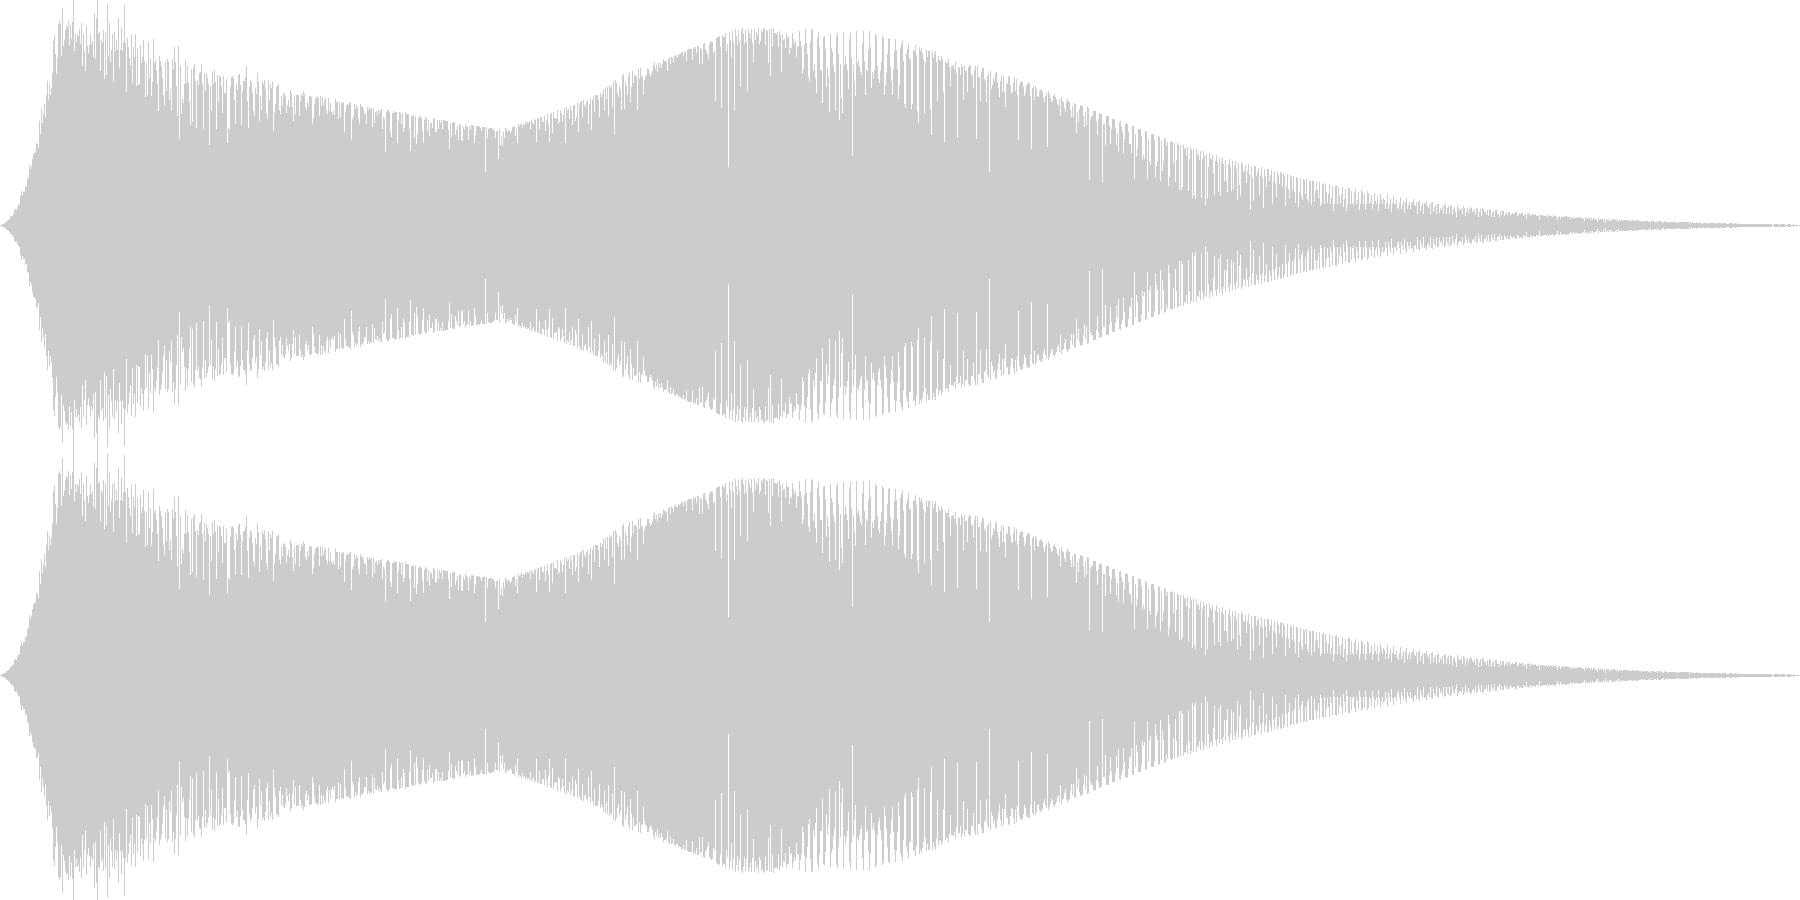 FM音源で作ったサウンドロゴ(ギュワー)の未再生の波形